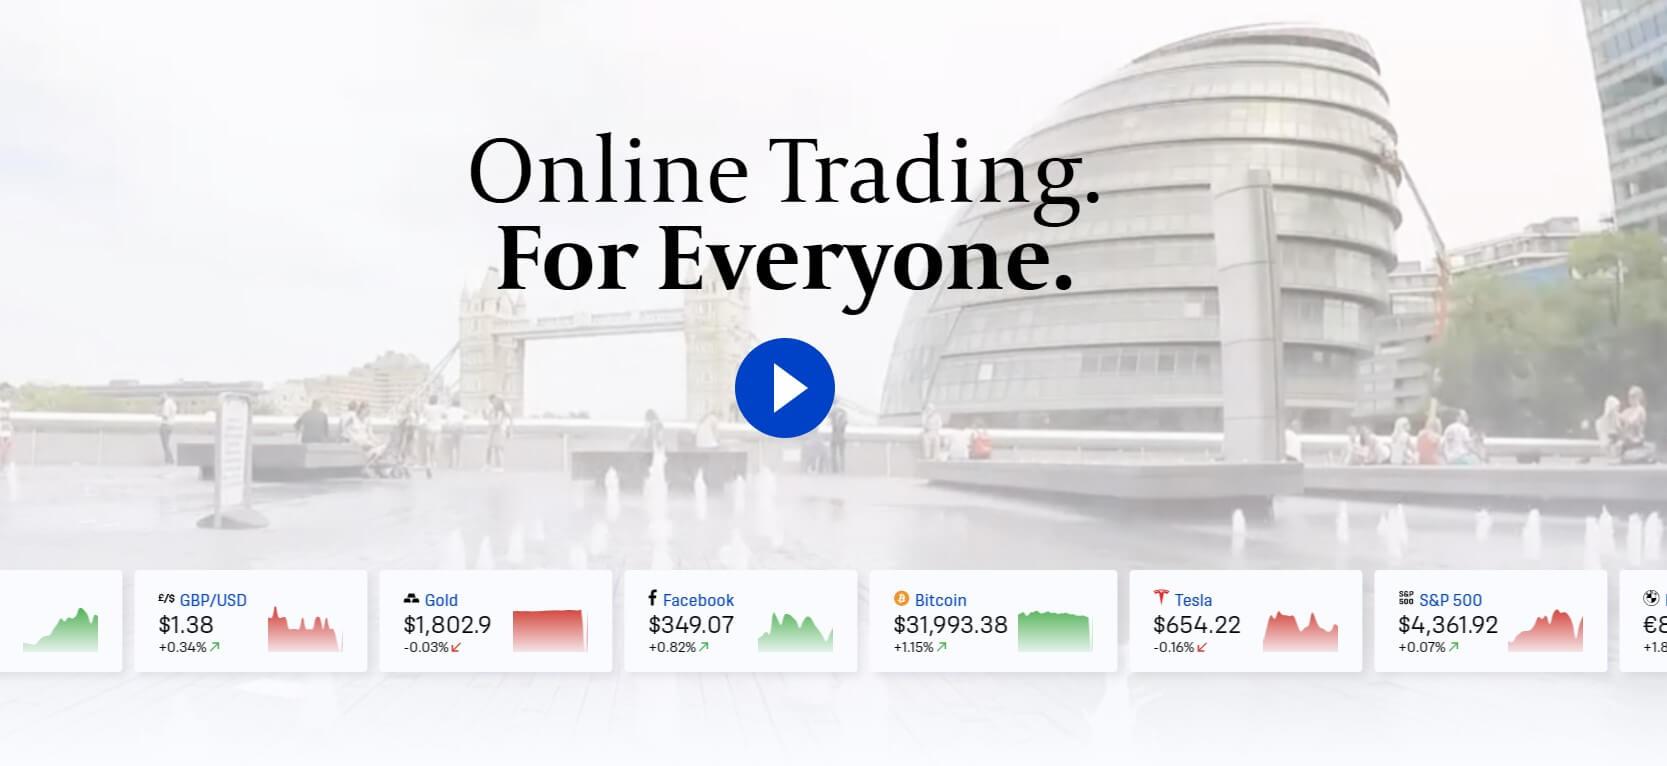 Broker Review: FinancialCentre